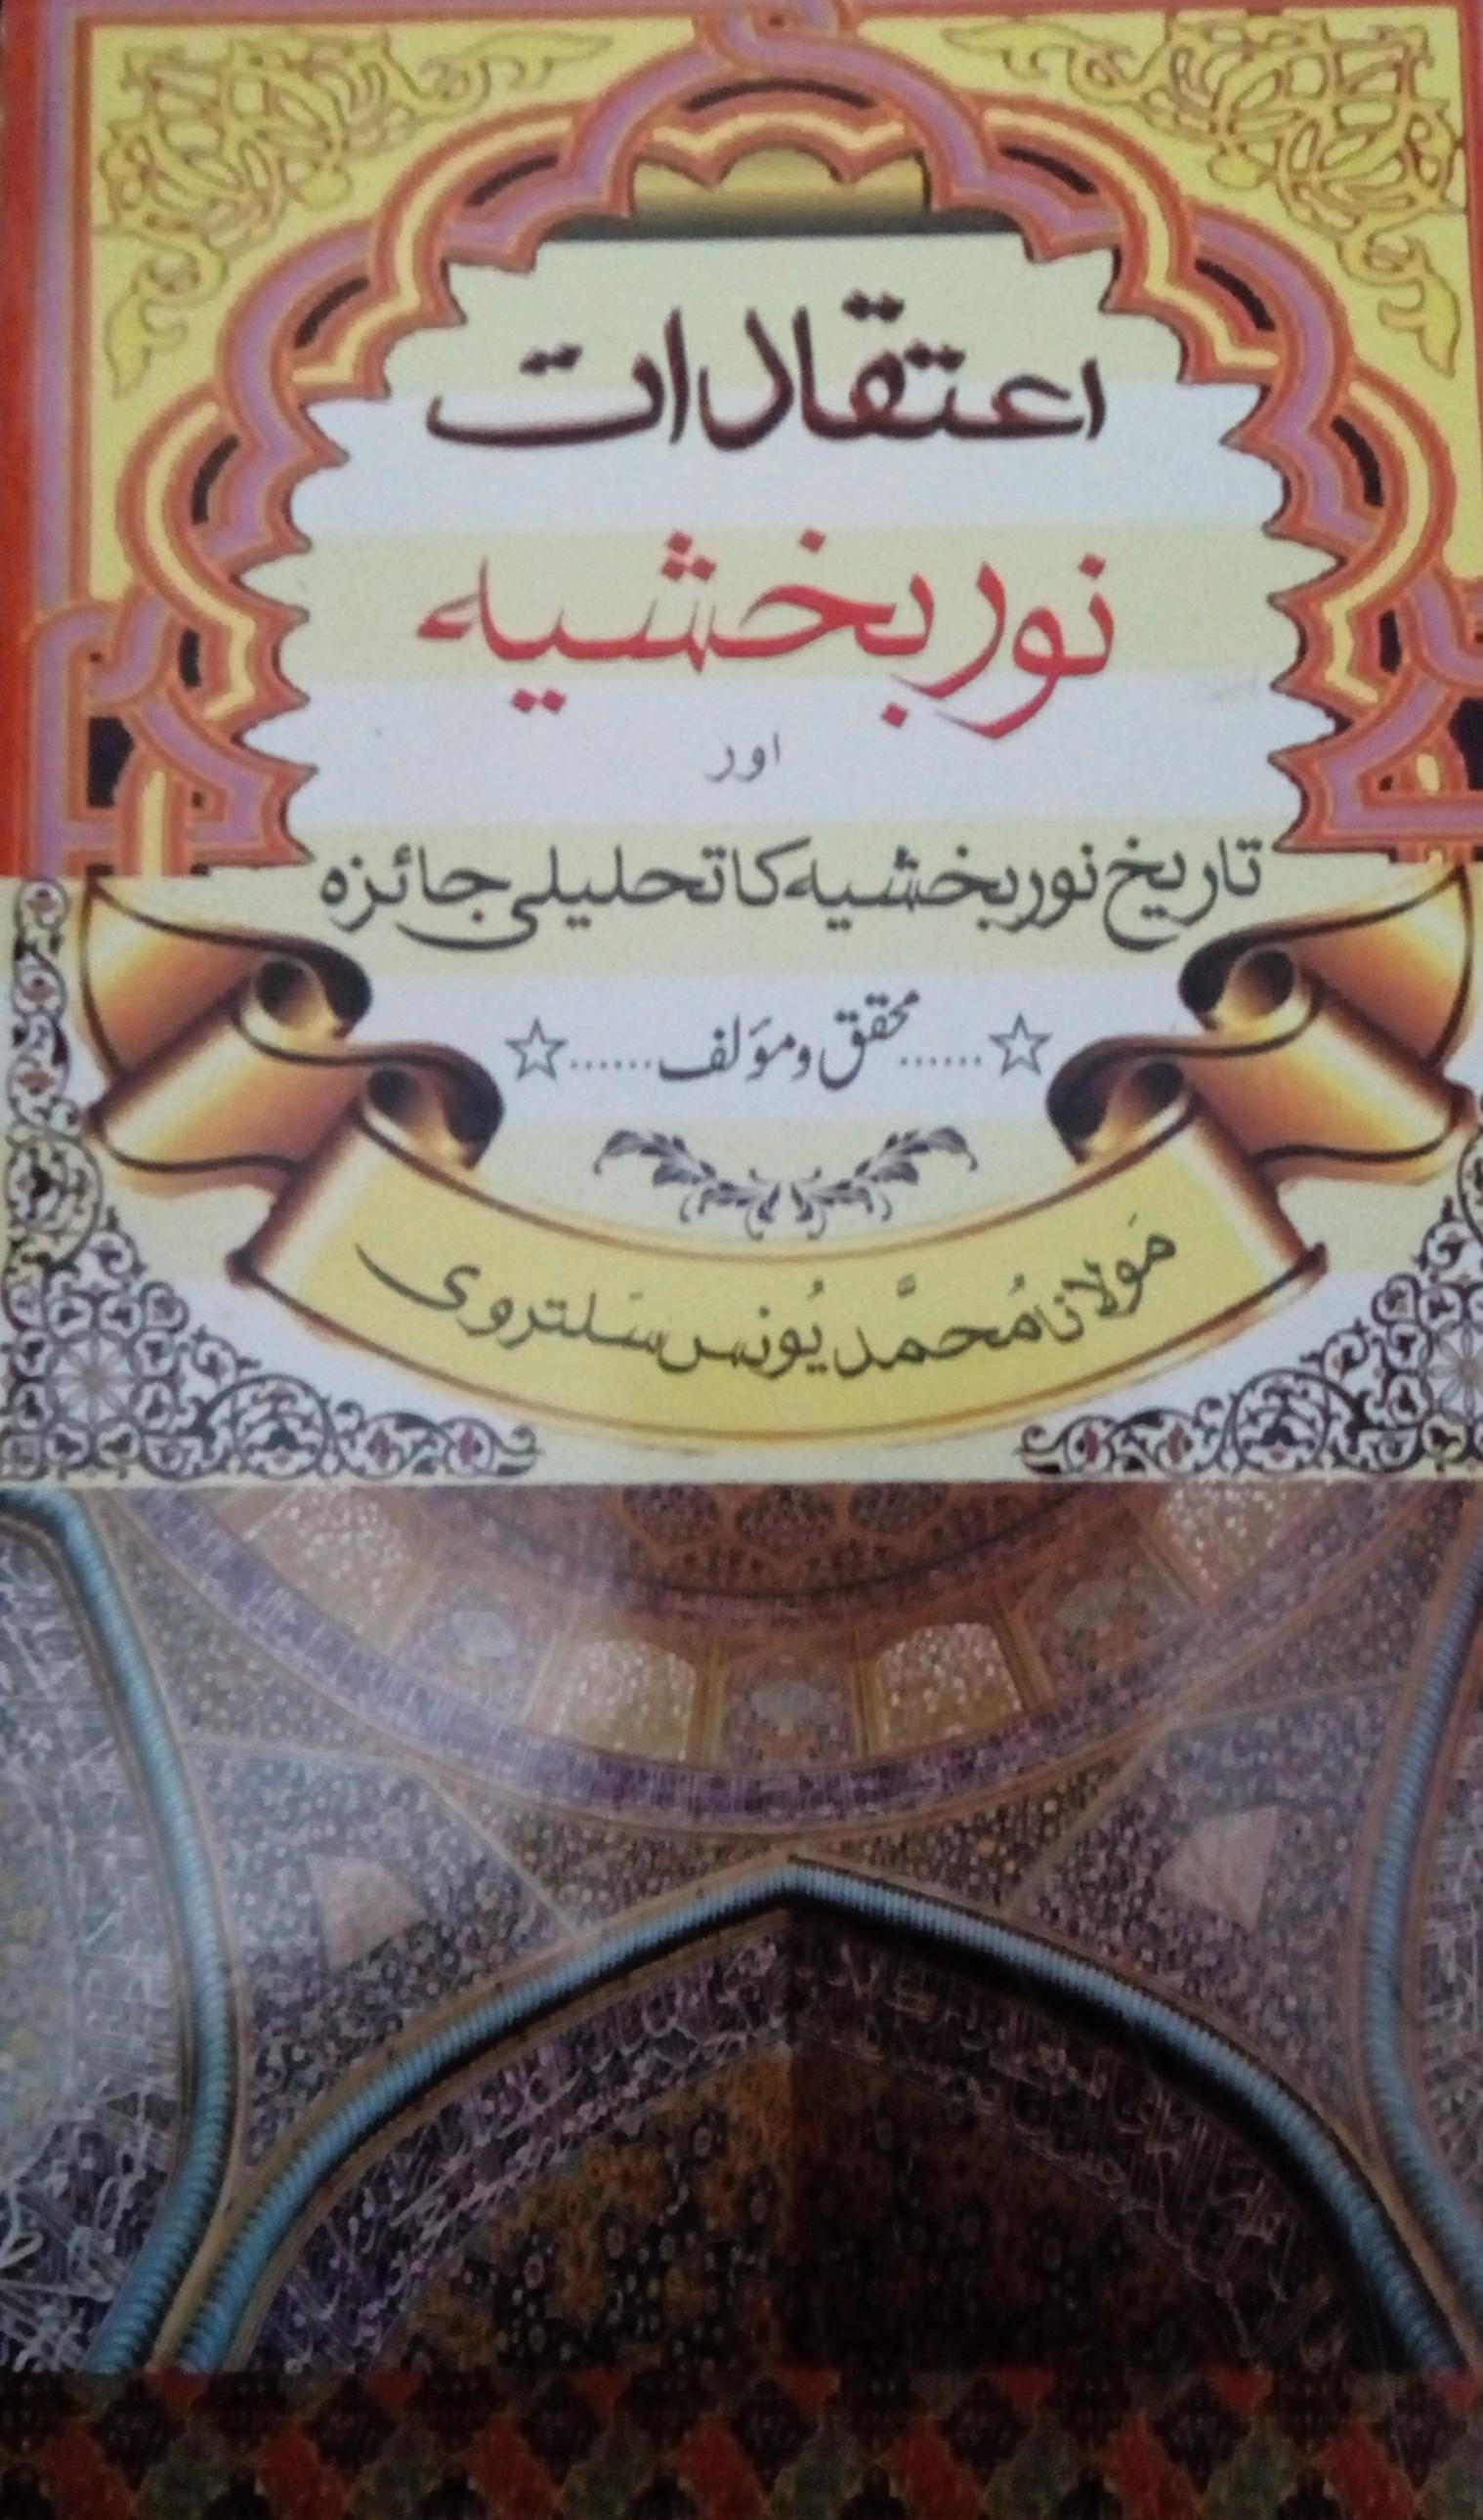 اعتقادات نوربخشیہ Itqadat noorbakhshia